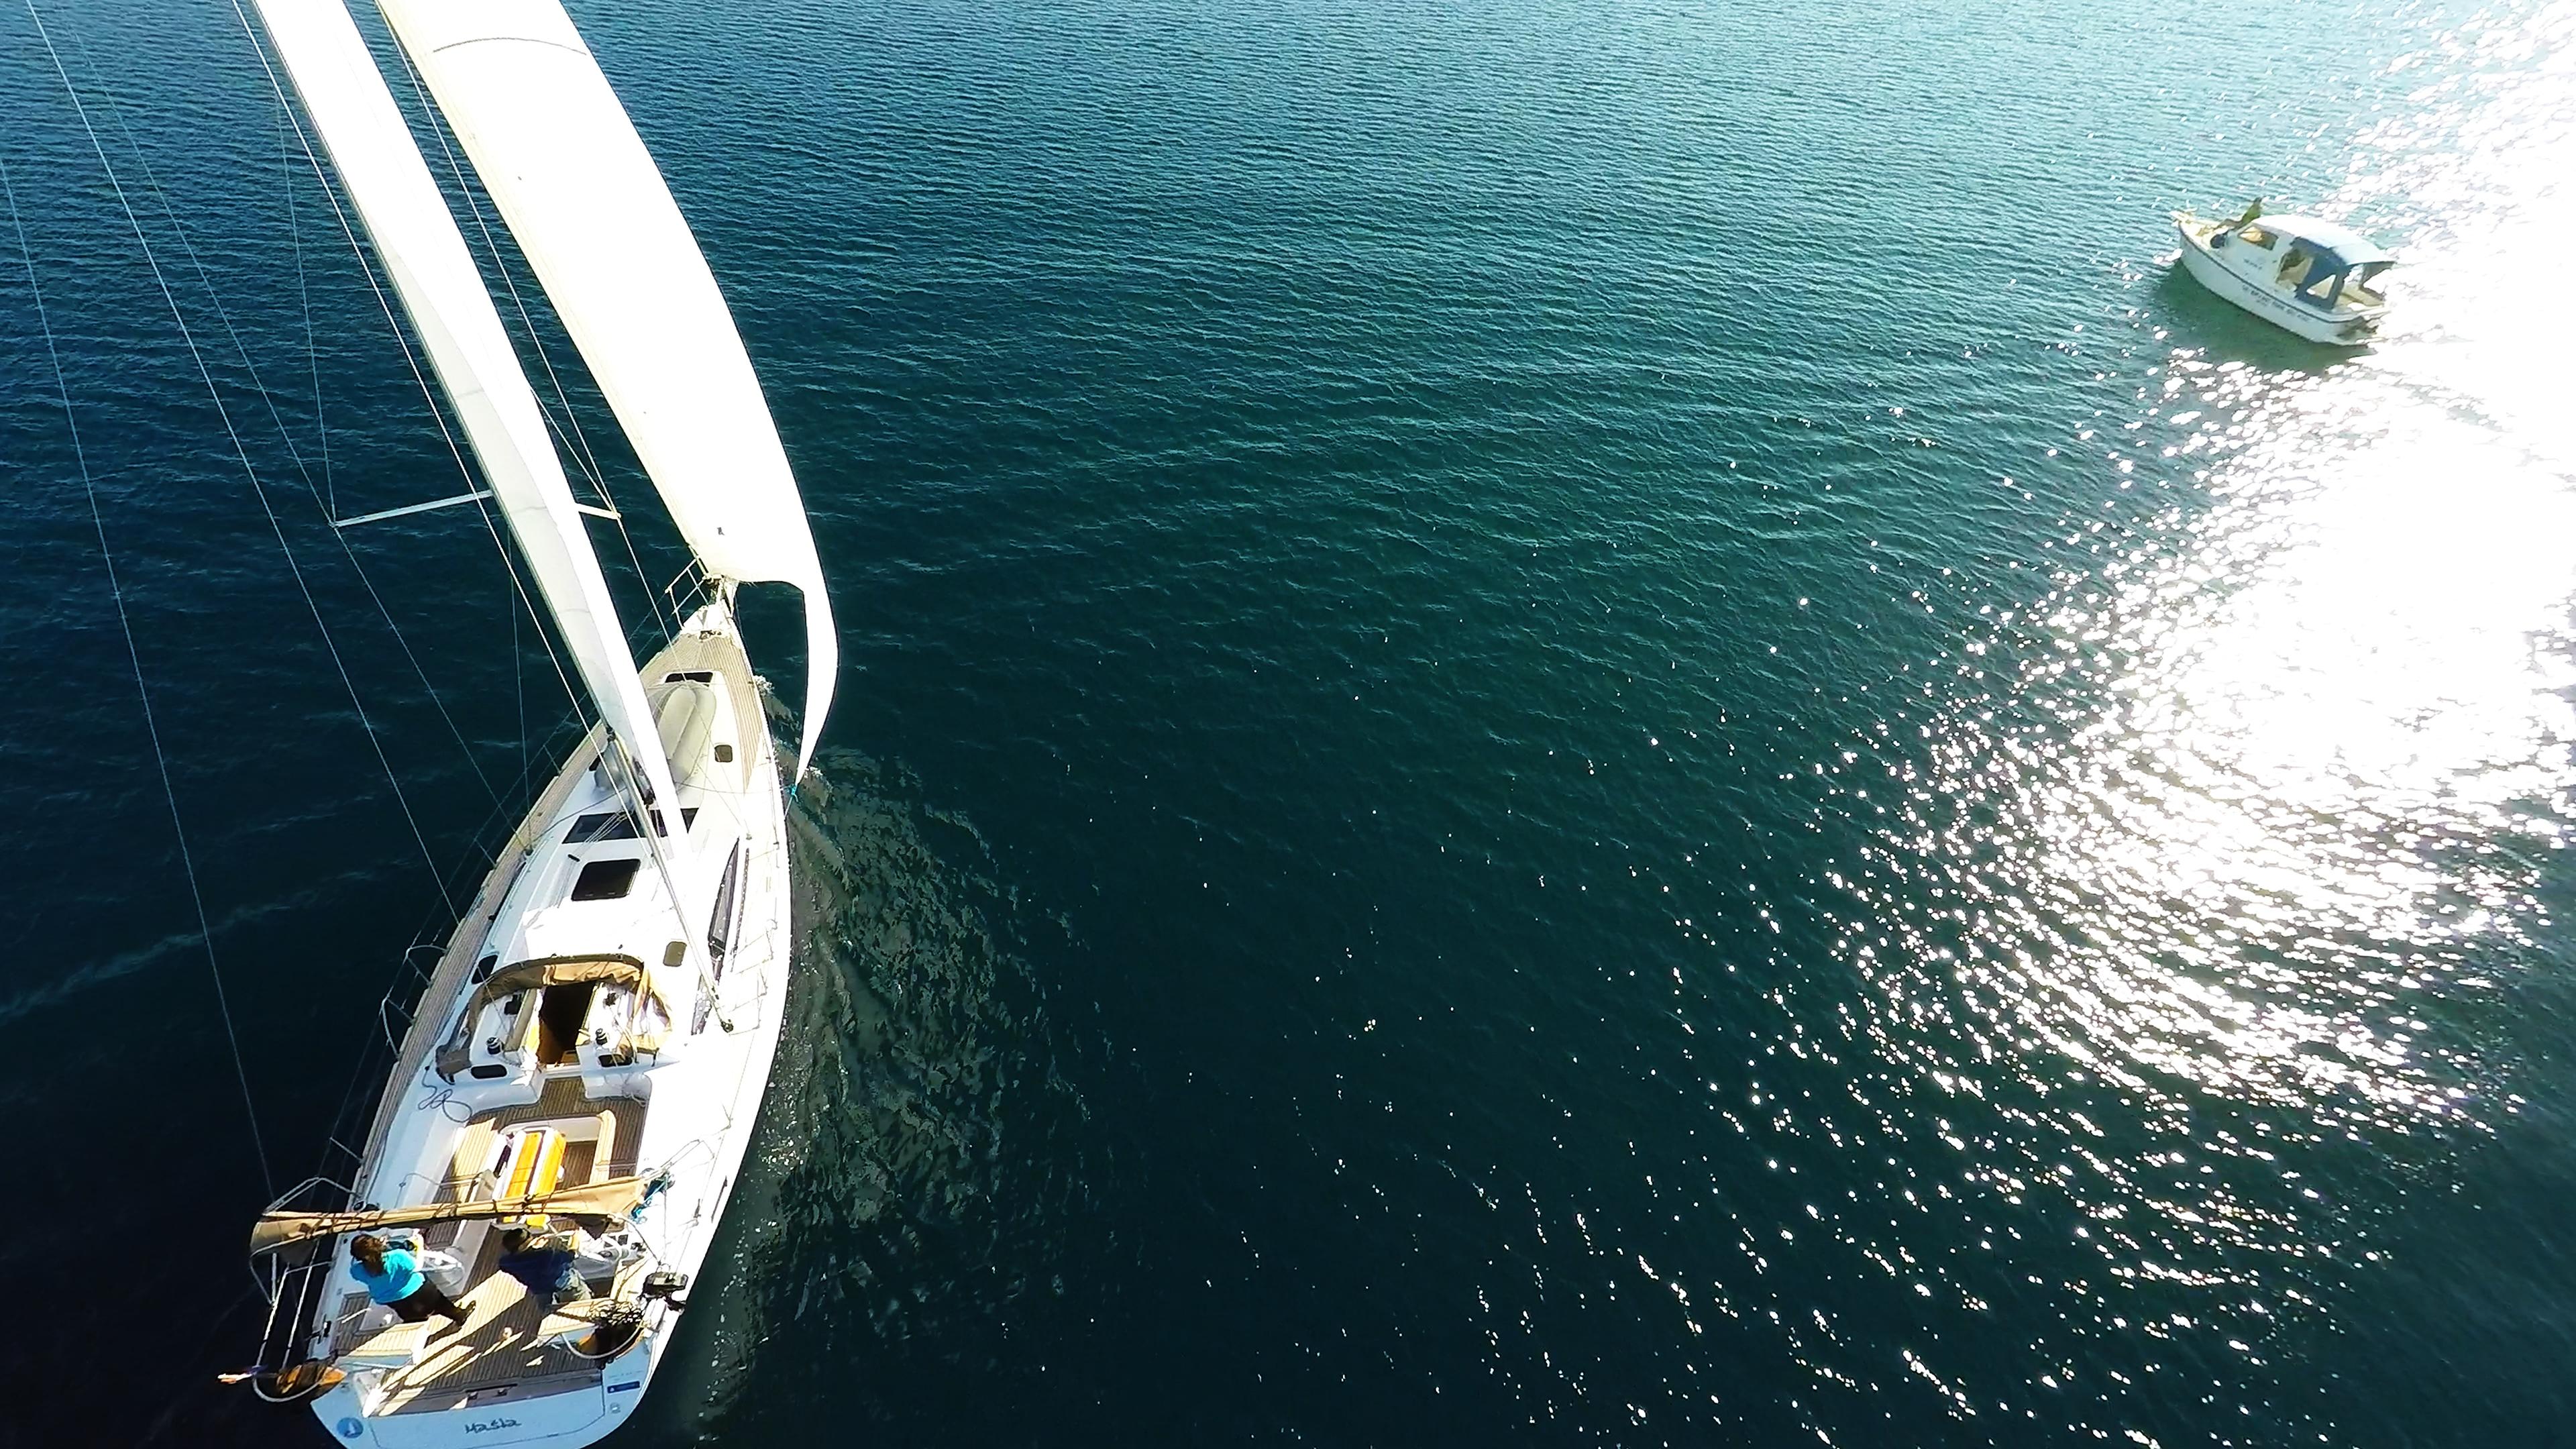 barcha a vela yacht a vela elan 45 vele ponte barca a motoree soleggiato